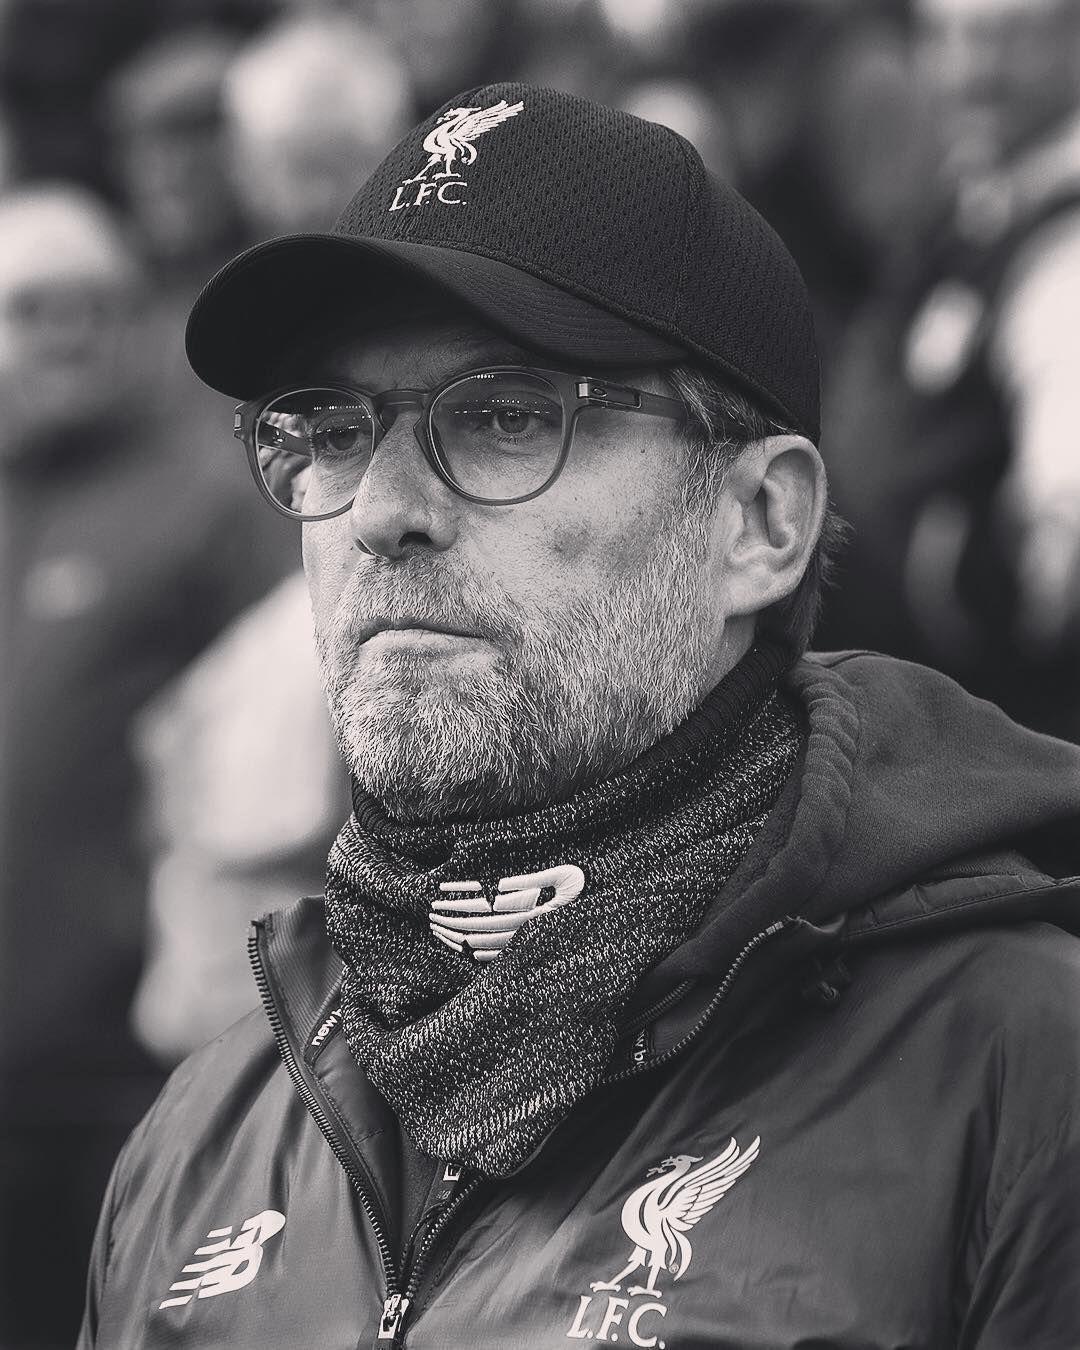 Jürgen Klopp Instagram